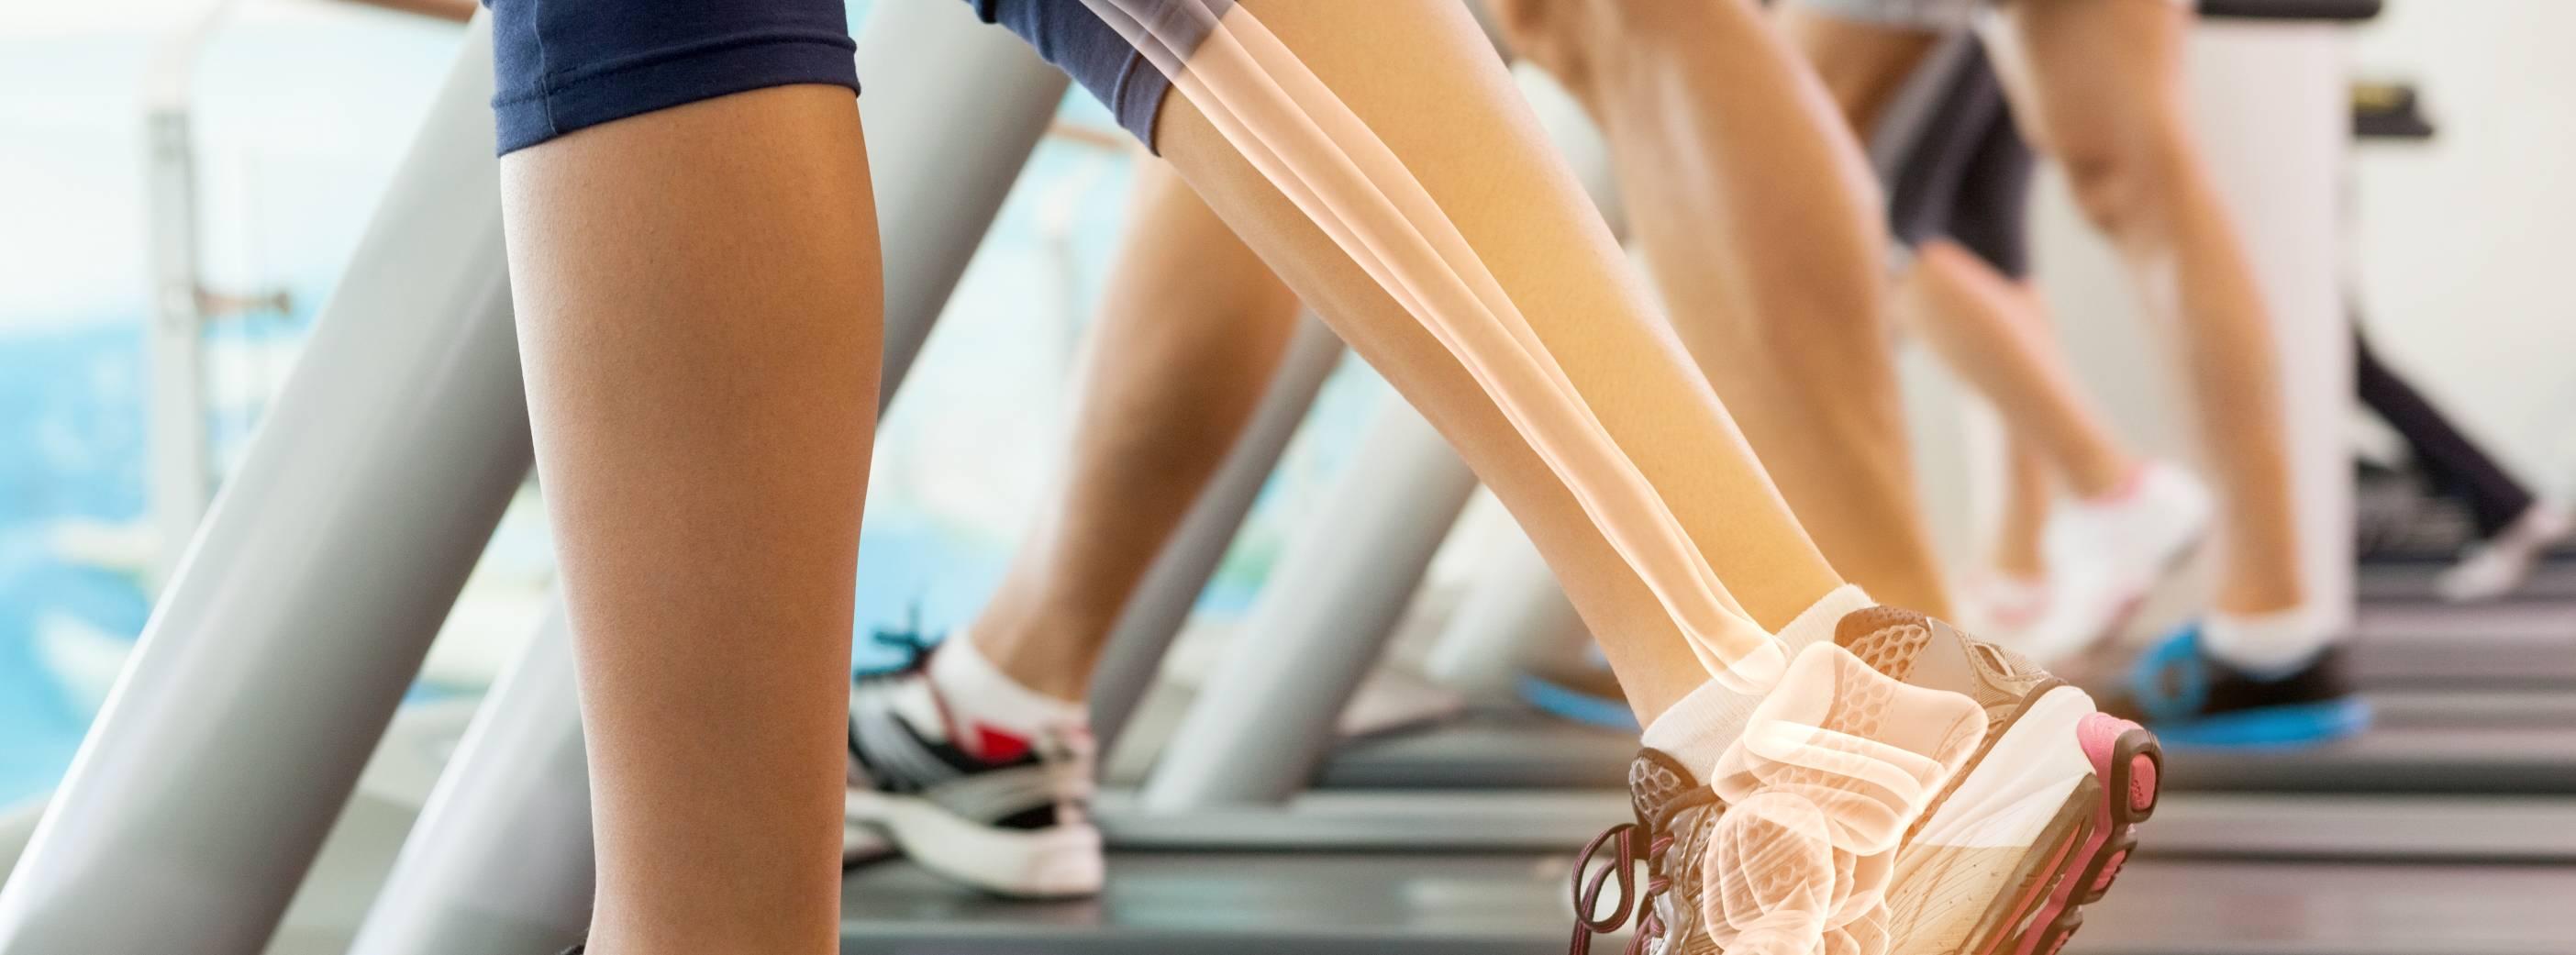 Dna postihuje nejčastěji palce u nohou - byroncaspergolf.com